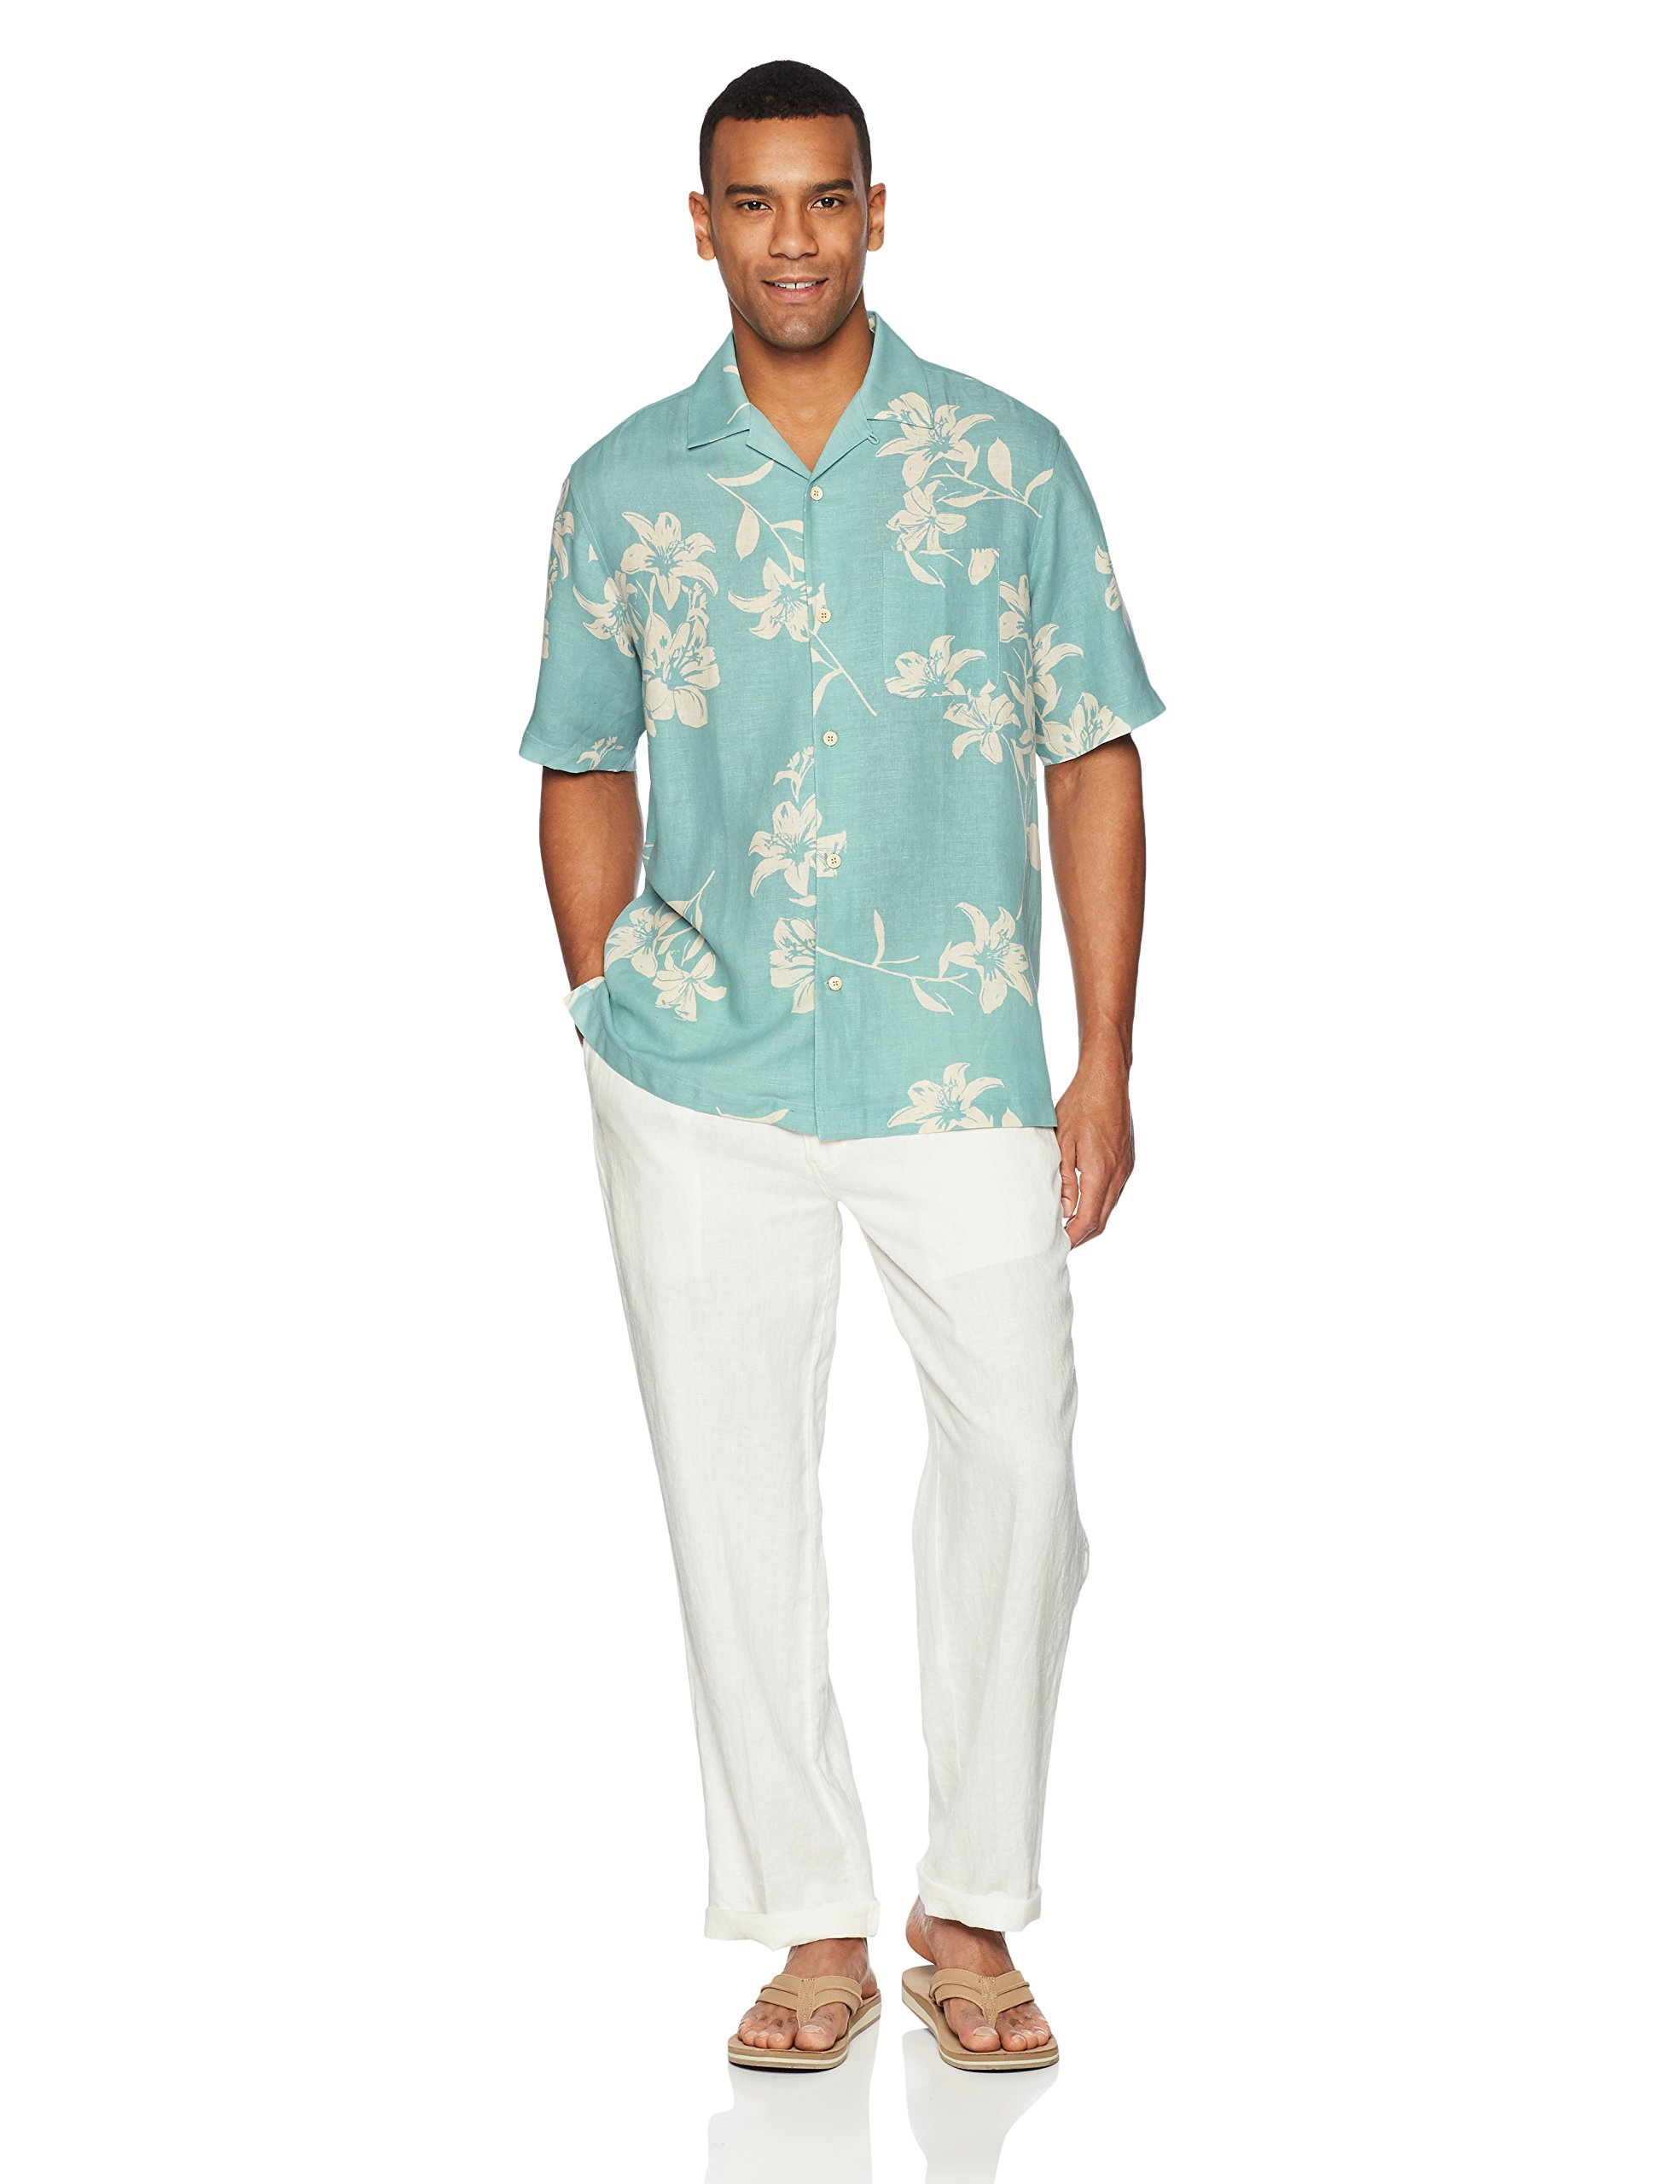 aa053baa7d94 28 Palms Men's Relaxed-Fit Silk/Linen Tropical Hawaiian Shirt, Aqua Vintage  Floral, Large - MPM25010-441-L < Casual Button-Down Shirts < Clothing, ...